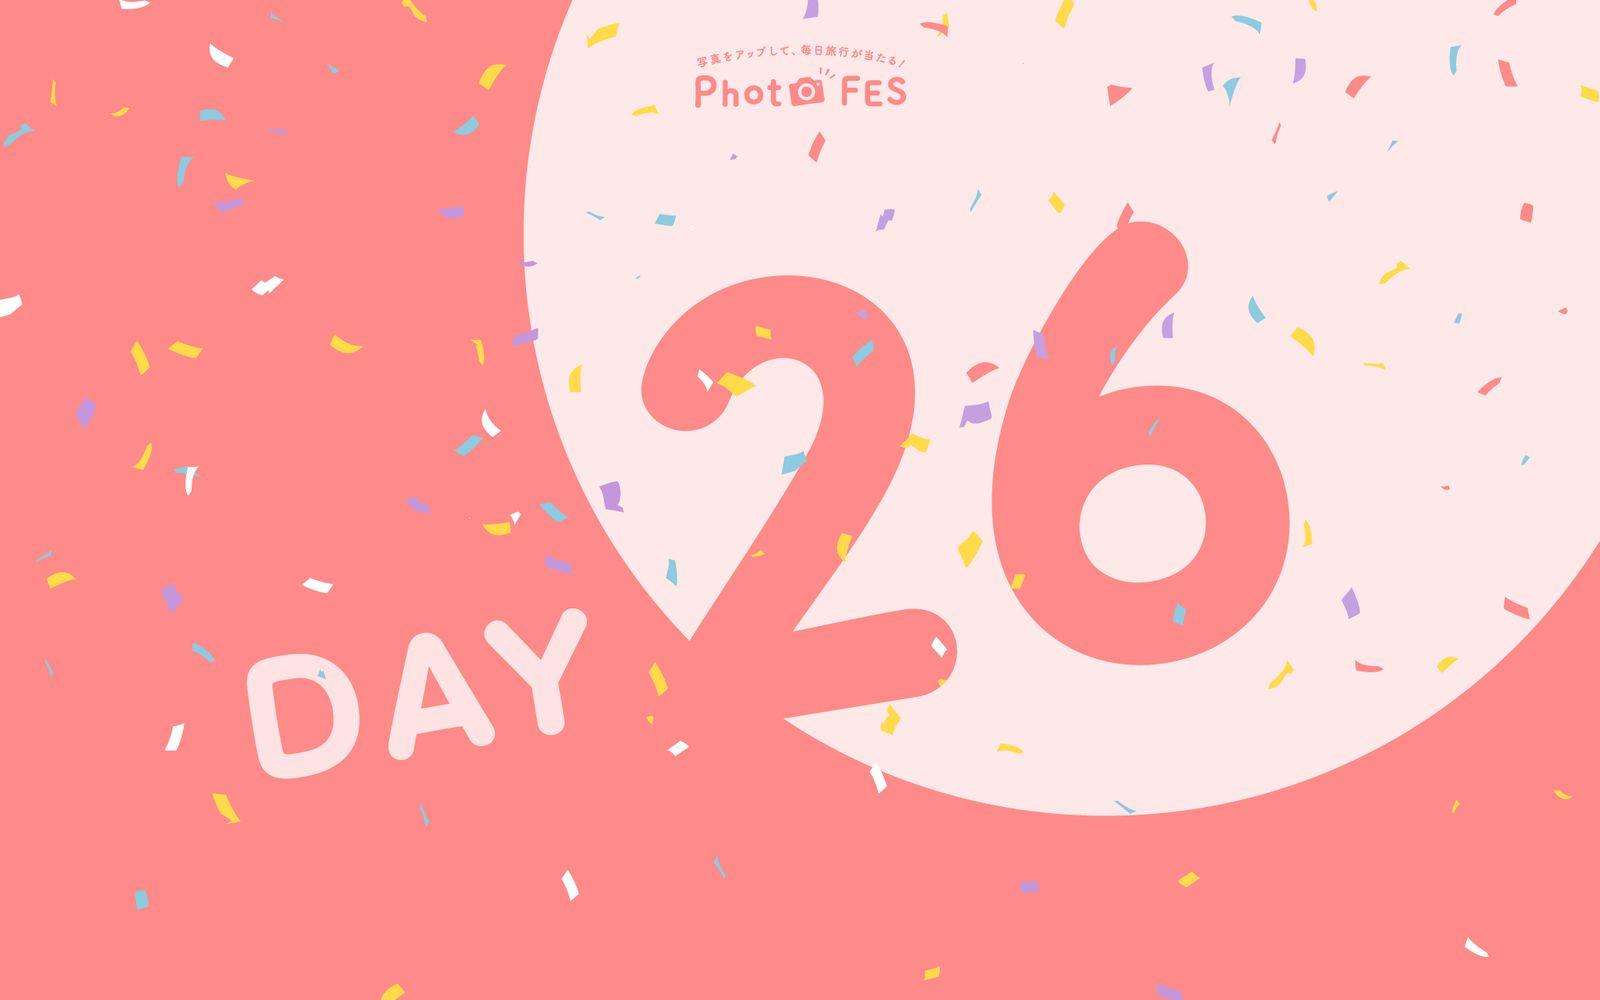 【DAY26】「Photo FES Summer」8月7日投稿分であたる賞品&受賞者発表